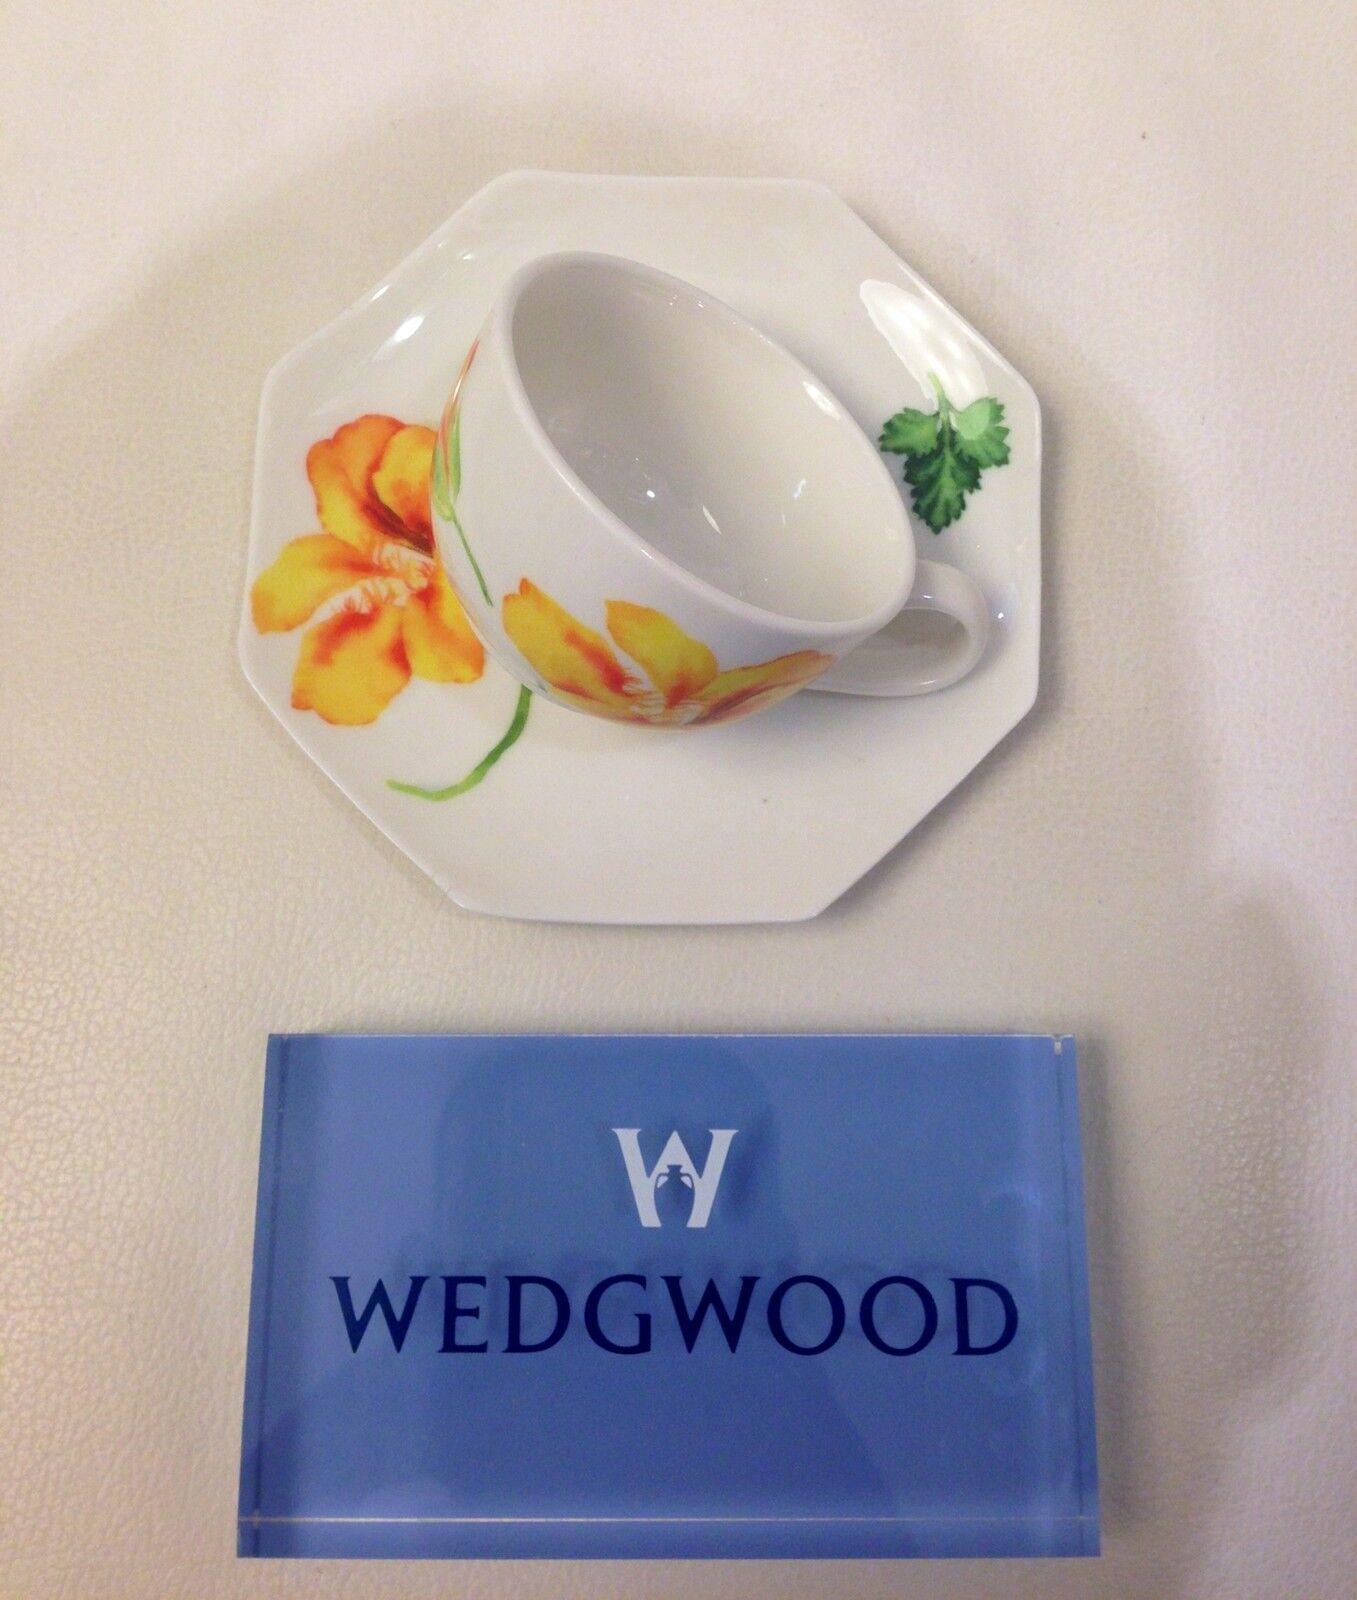 Tazza Caffè x12 - - - Tazza Espresso - Porcellana - Chelsea Garden - Wedgwood 9ed676